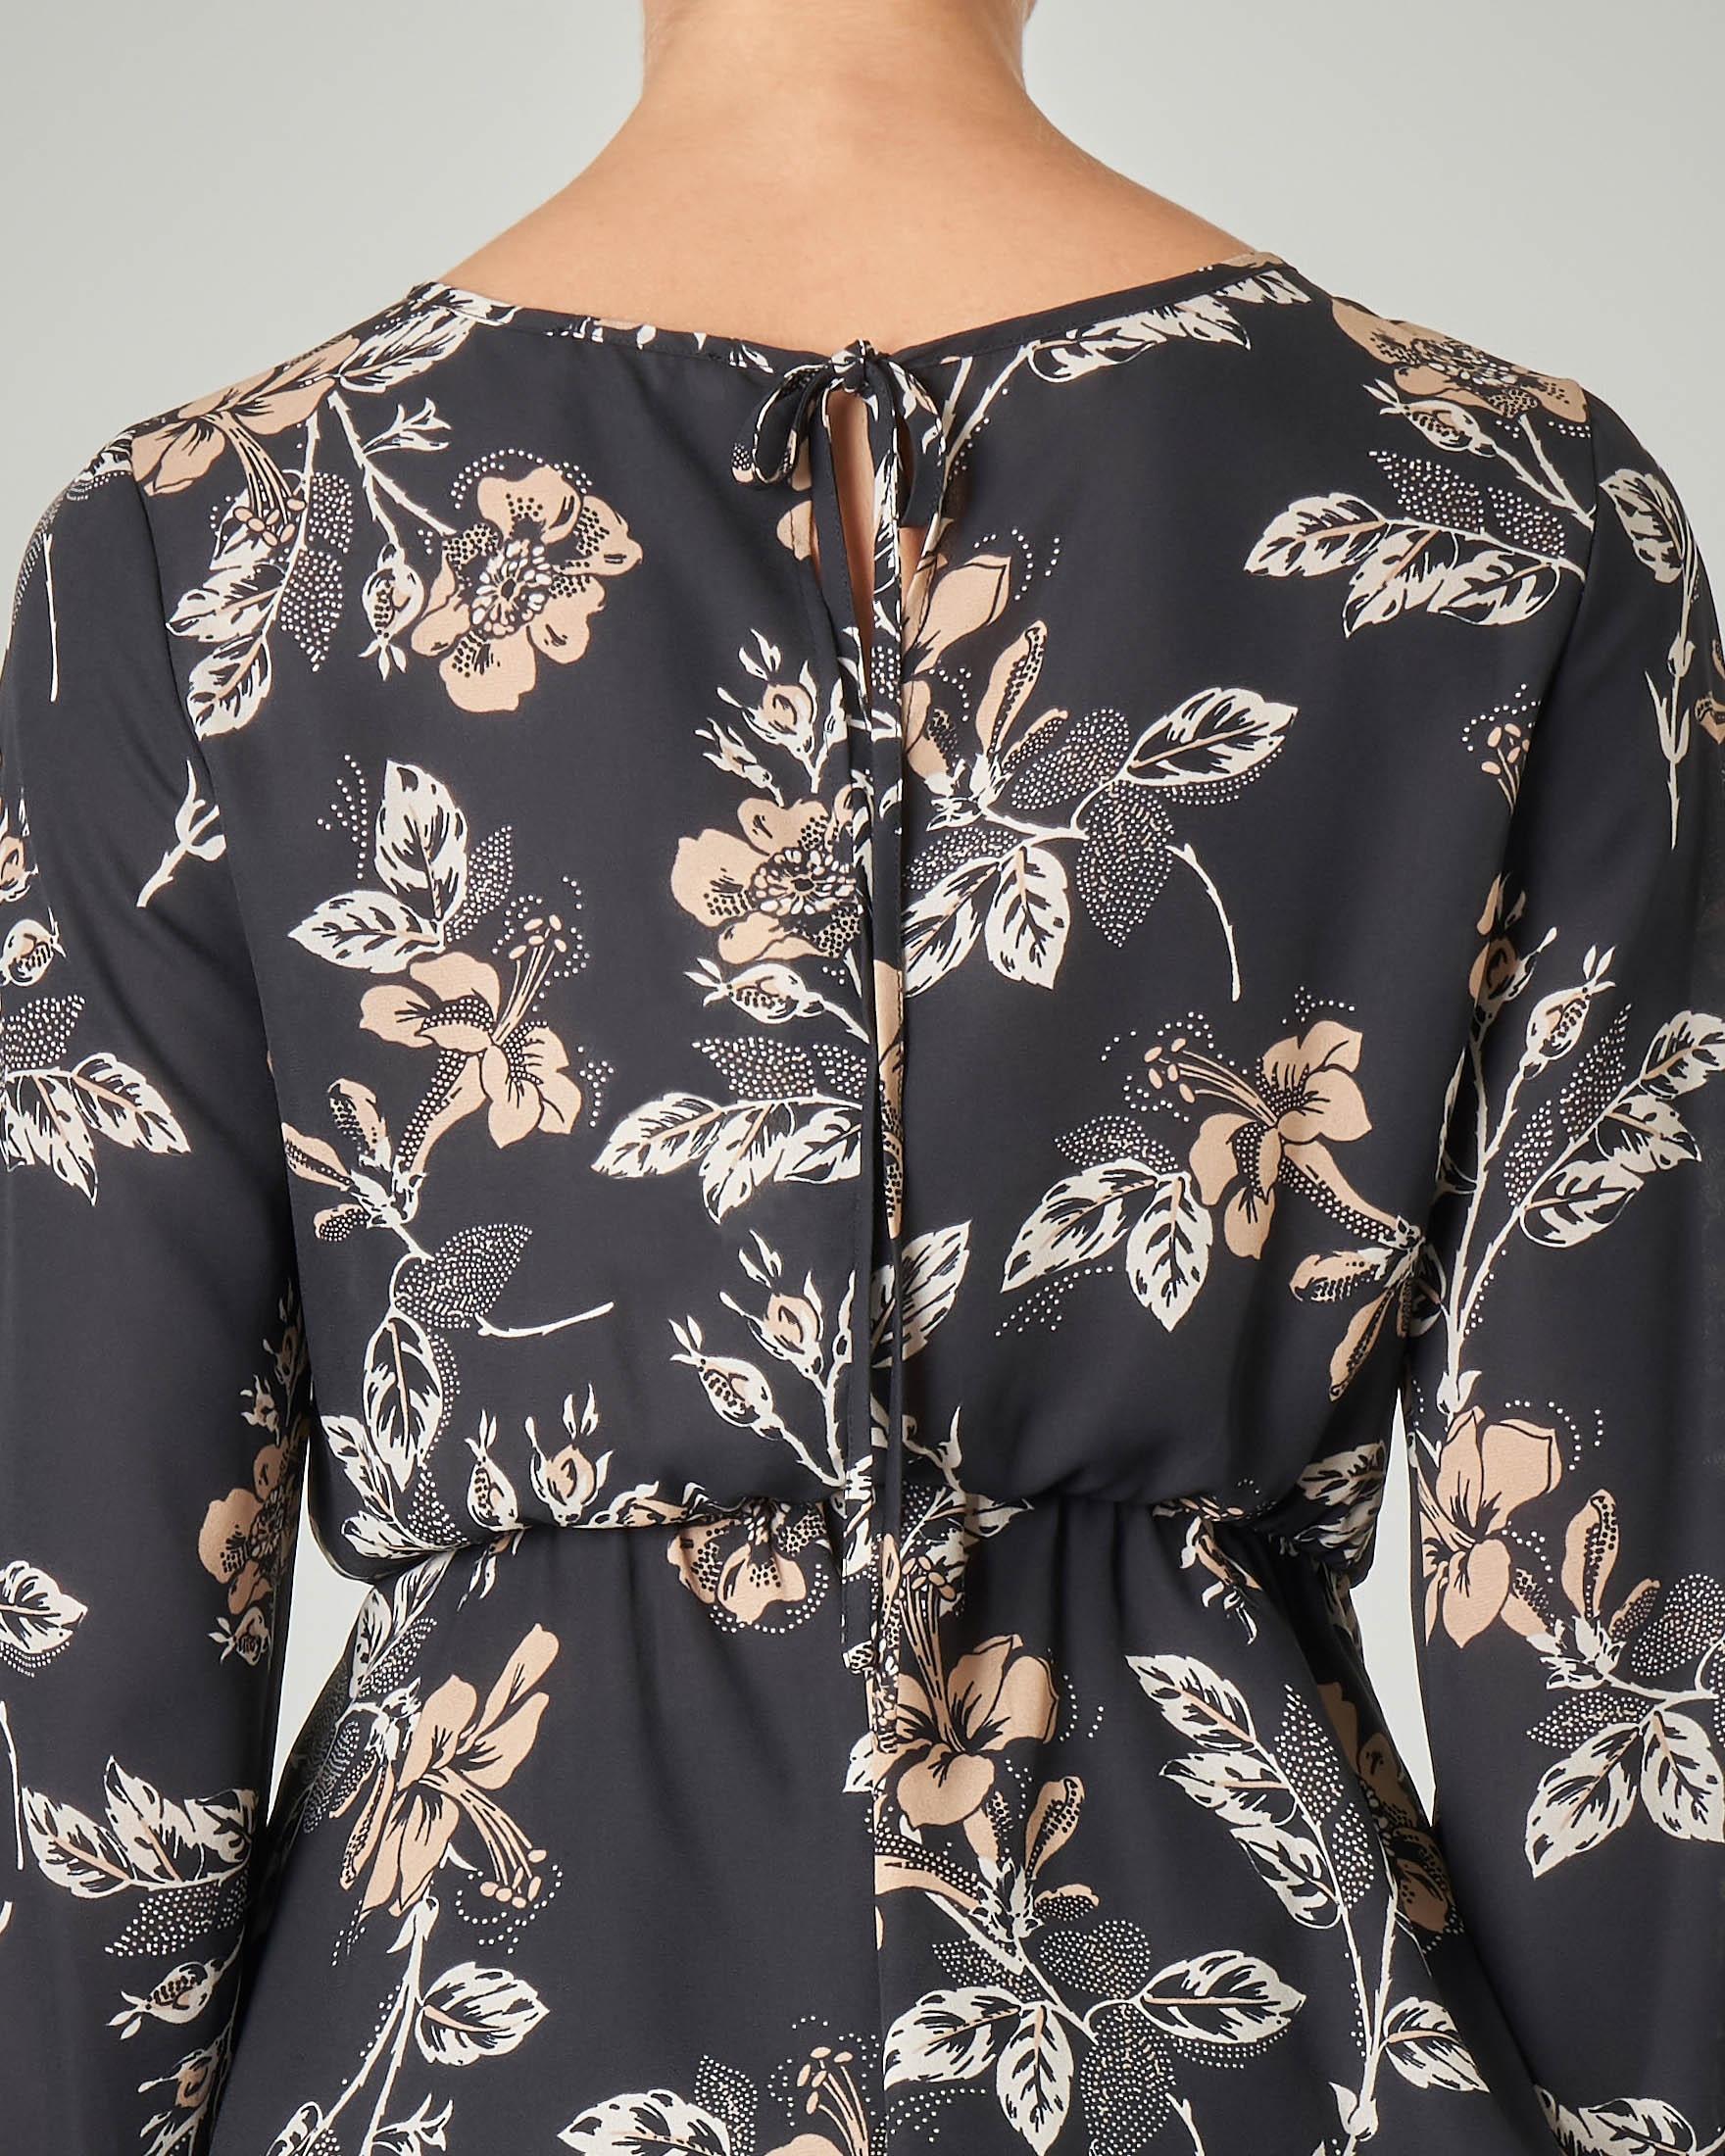 Blusa maniche lunghe nera a fantasia a fiori cipria e volant in vita